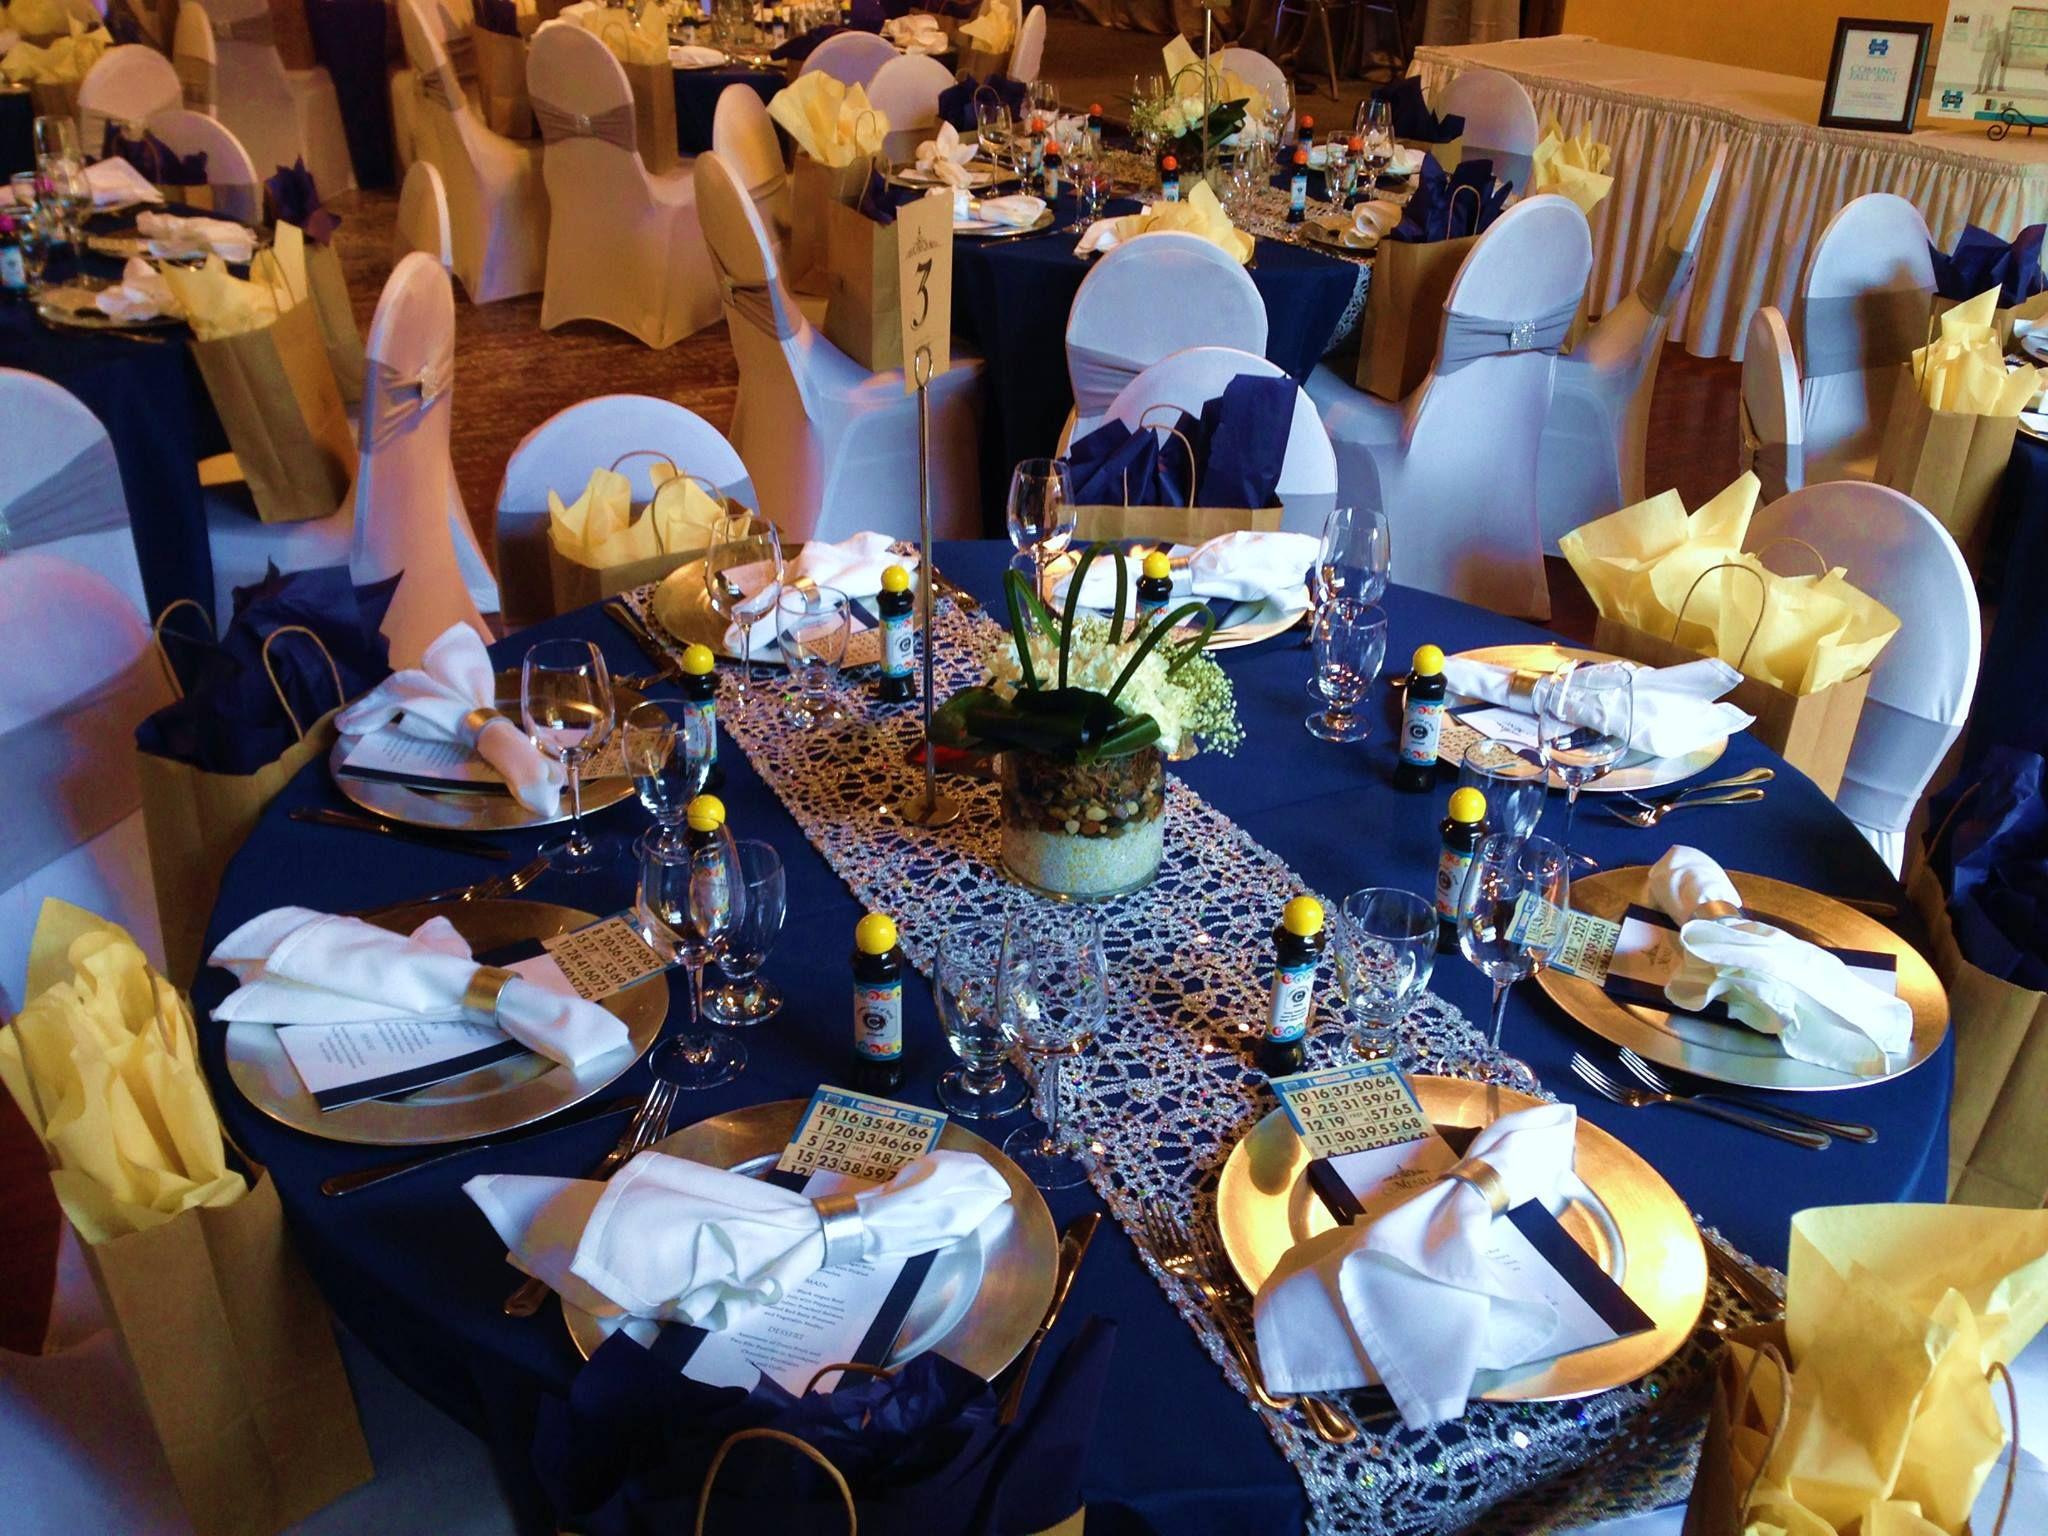 Captain S Dinner Nautical Theme Gala Navy White And